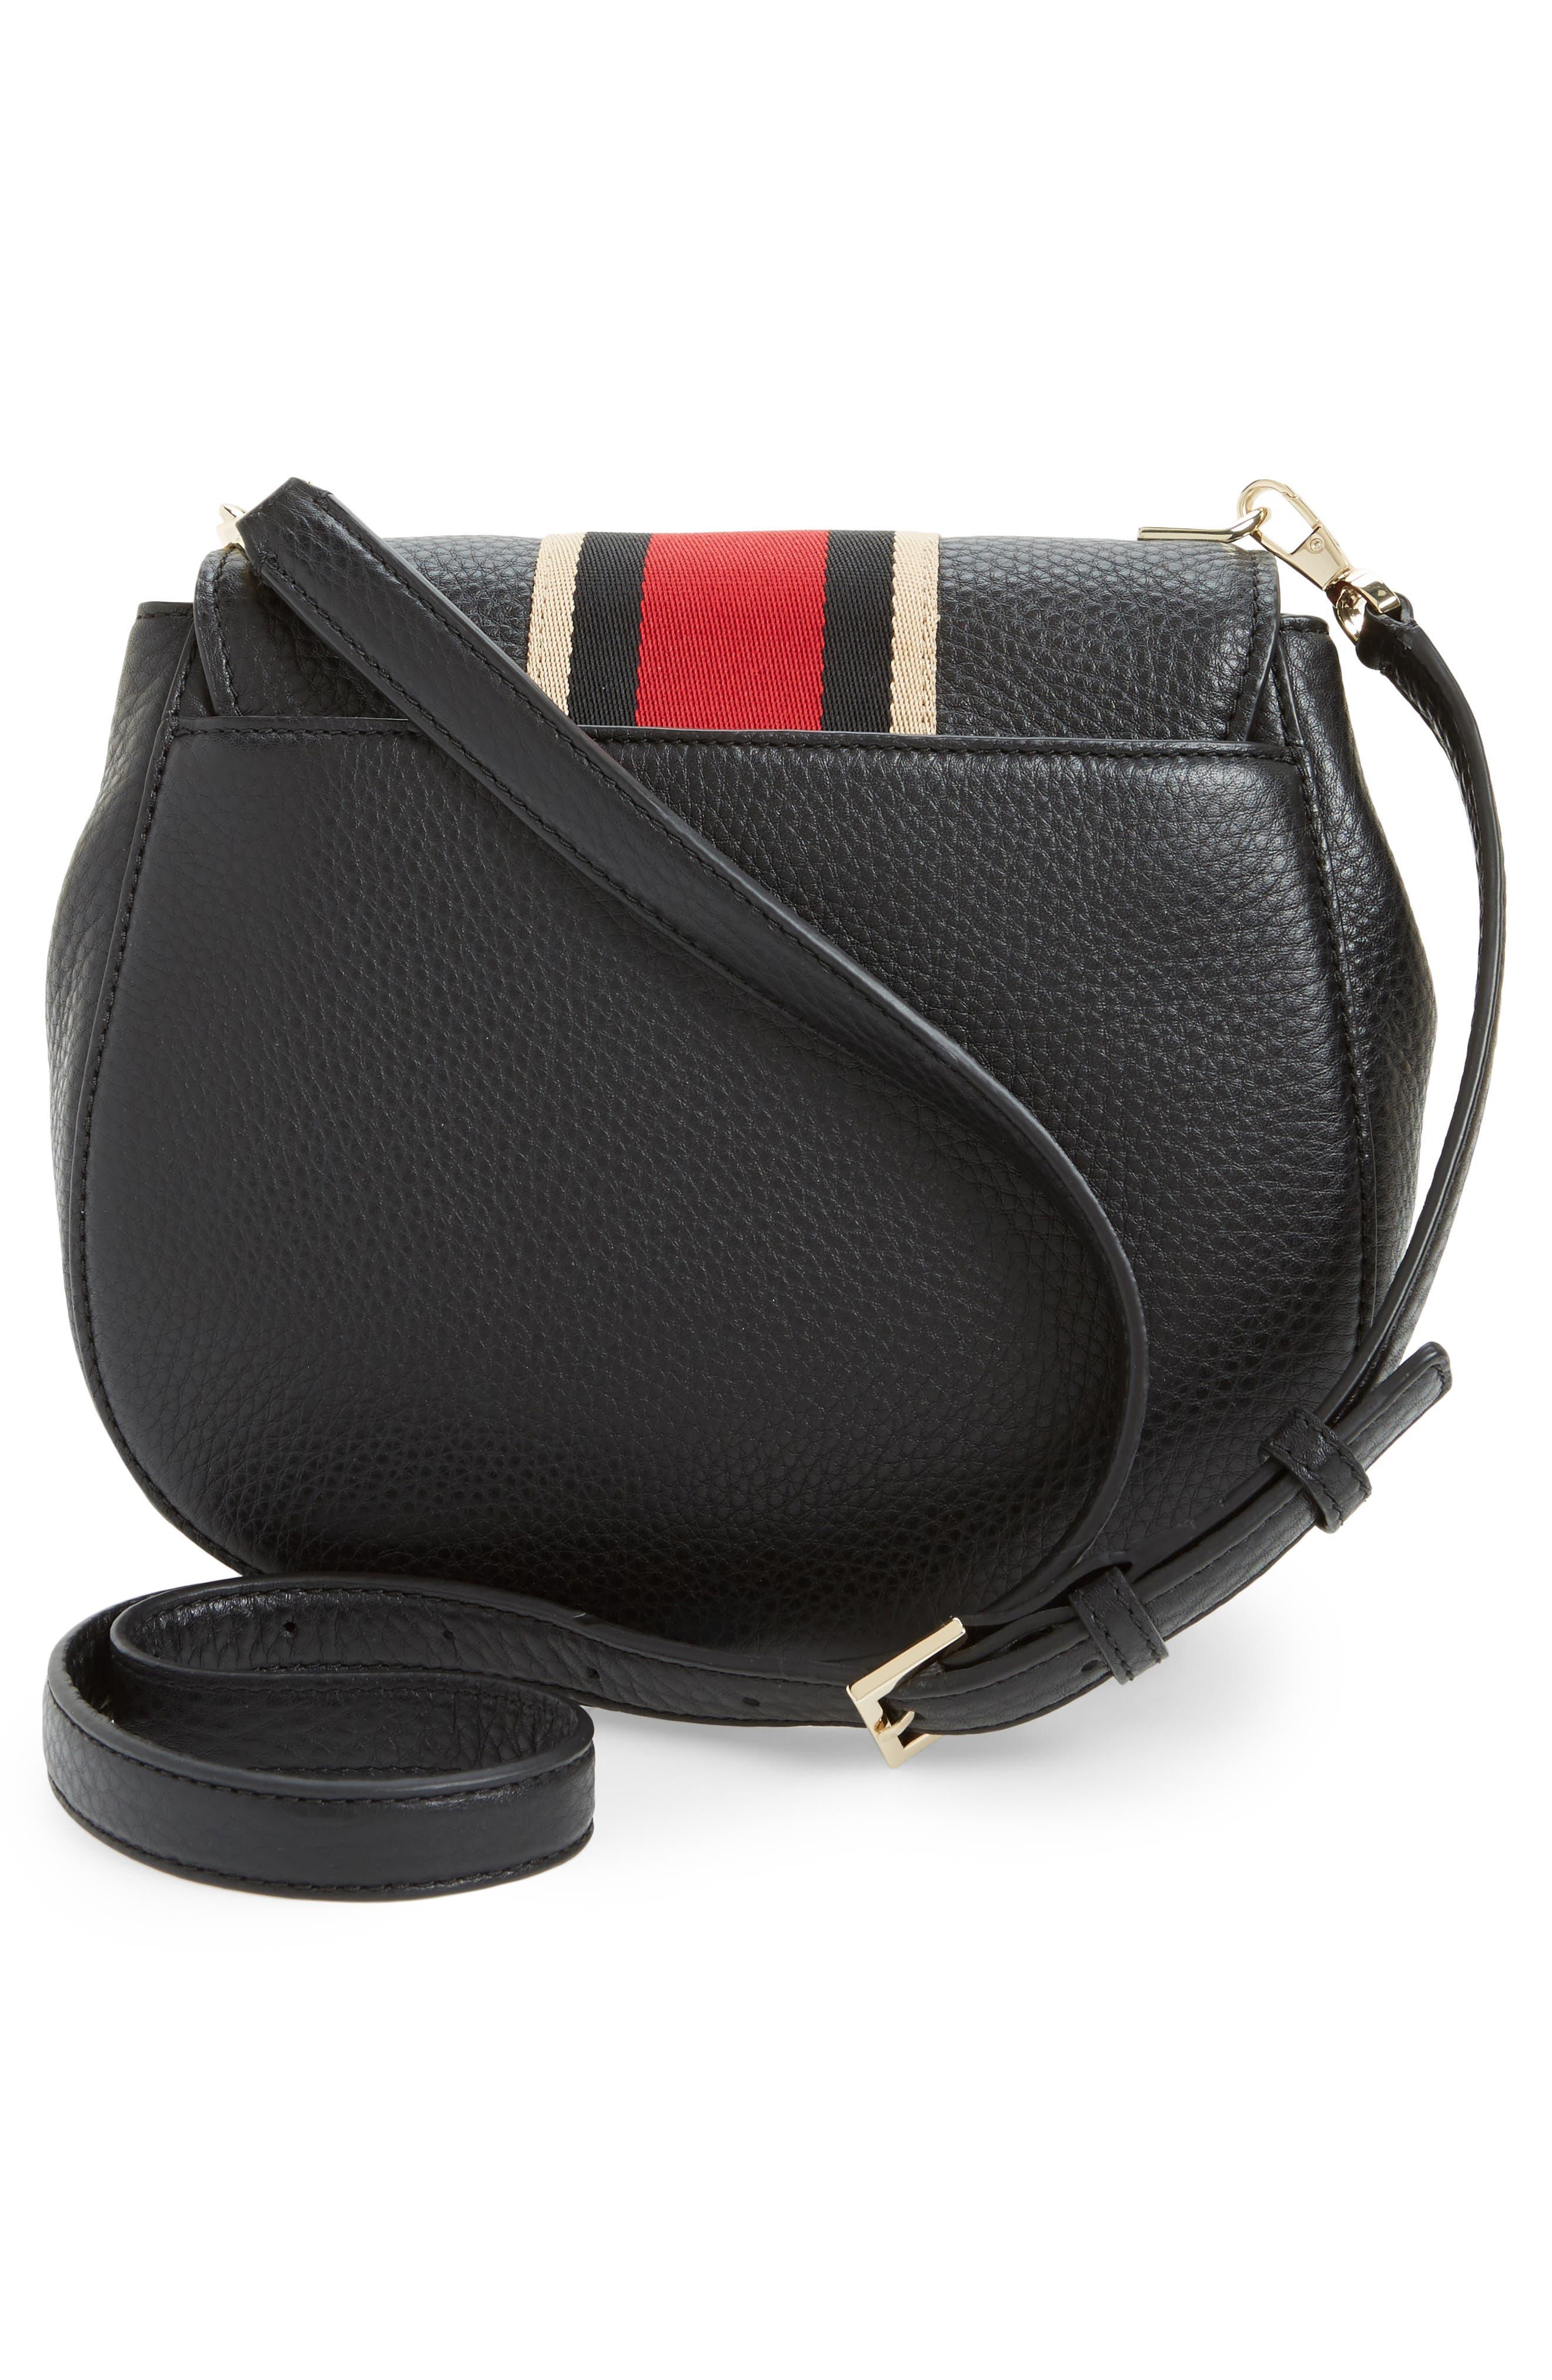 madison stewart street - byrdie studded leather satchel,                             Alternate thumbnail 3, color,                             631